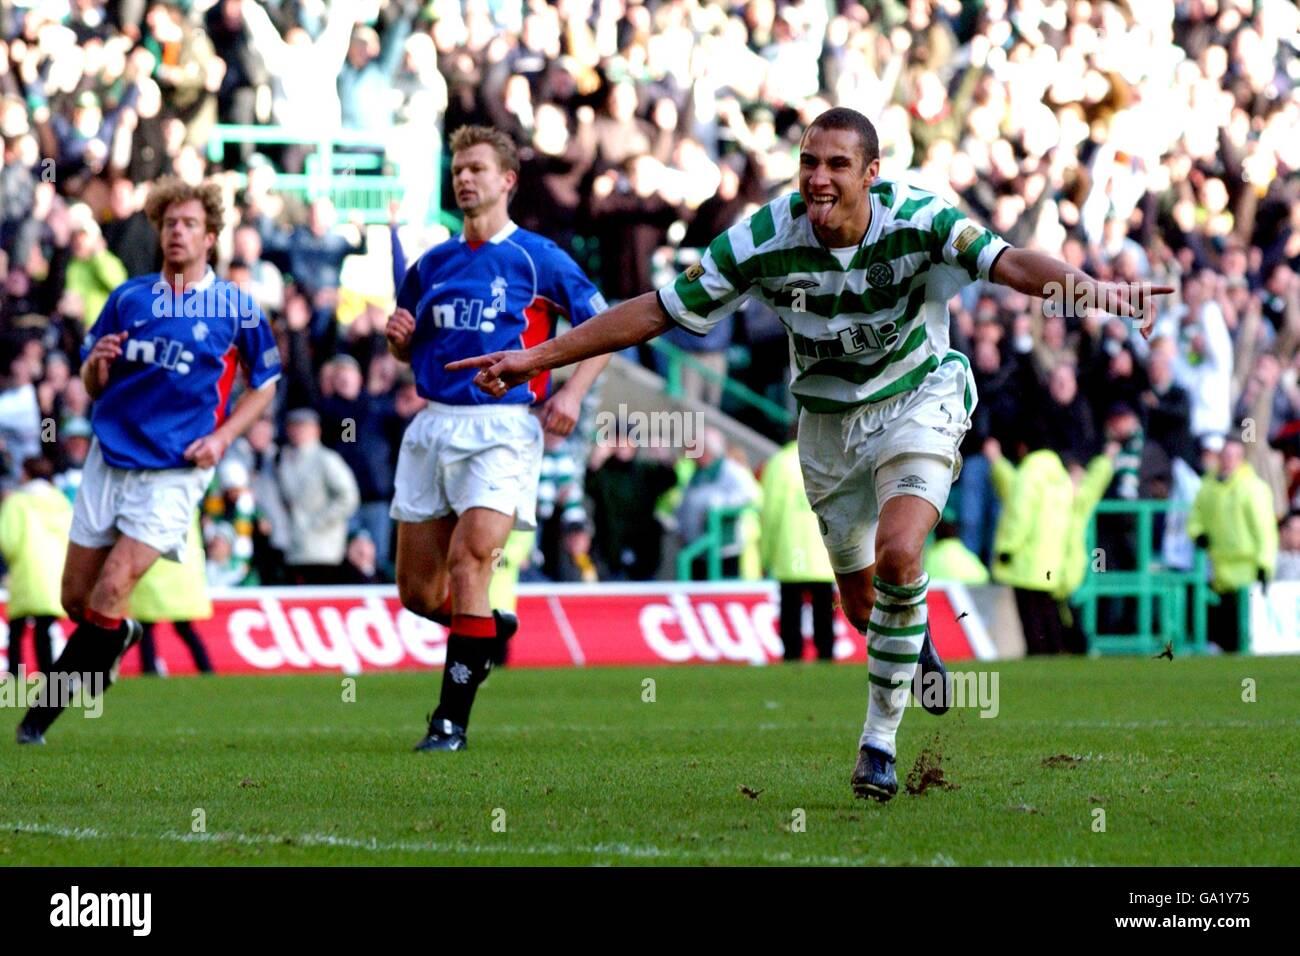 Scottish Soccer - Bank Of Scotland Premier League - Celtic v Rangers - Stock Image